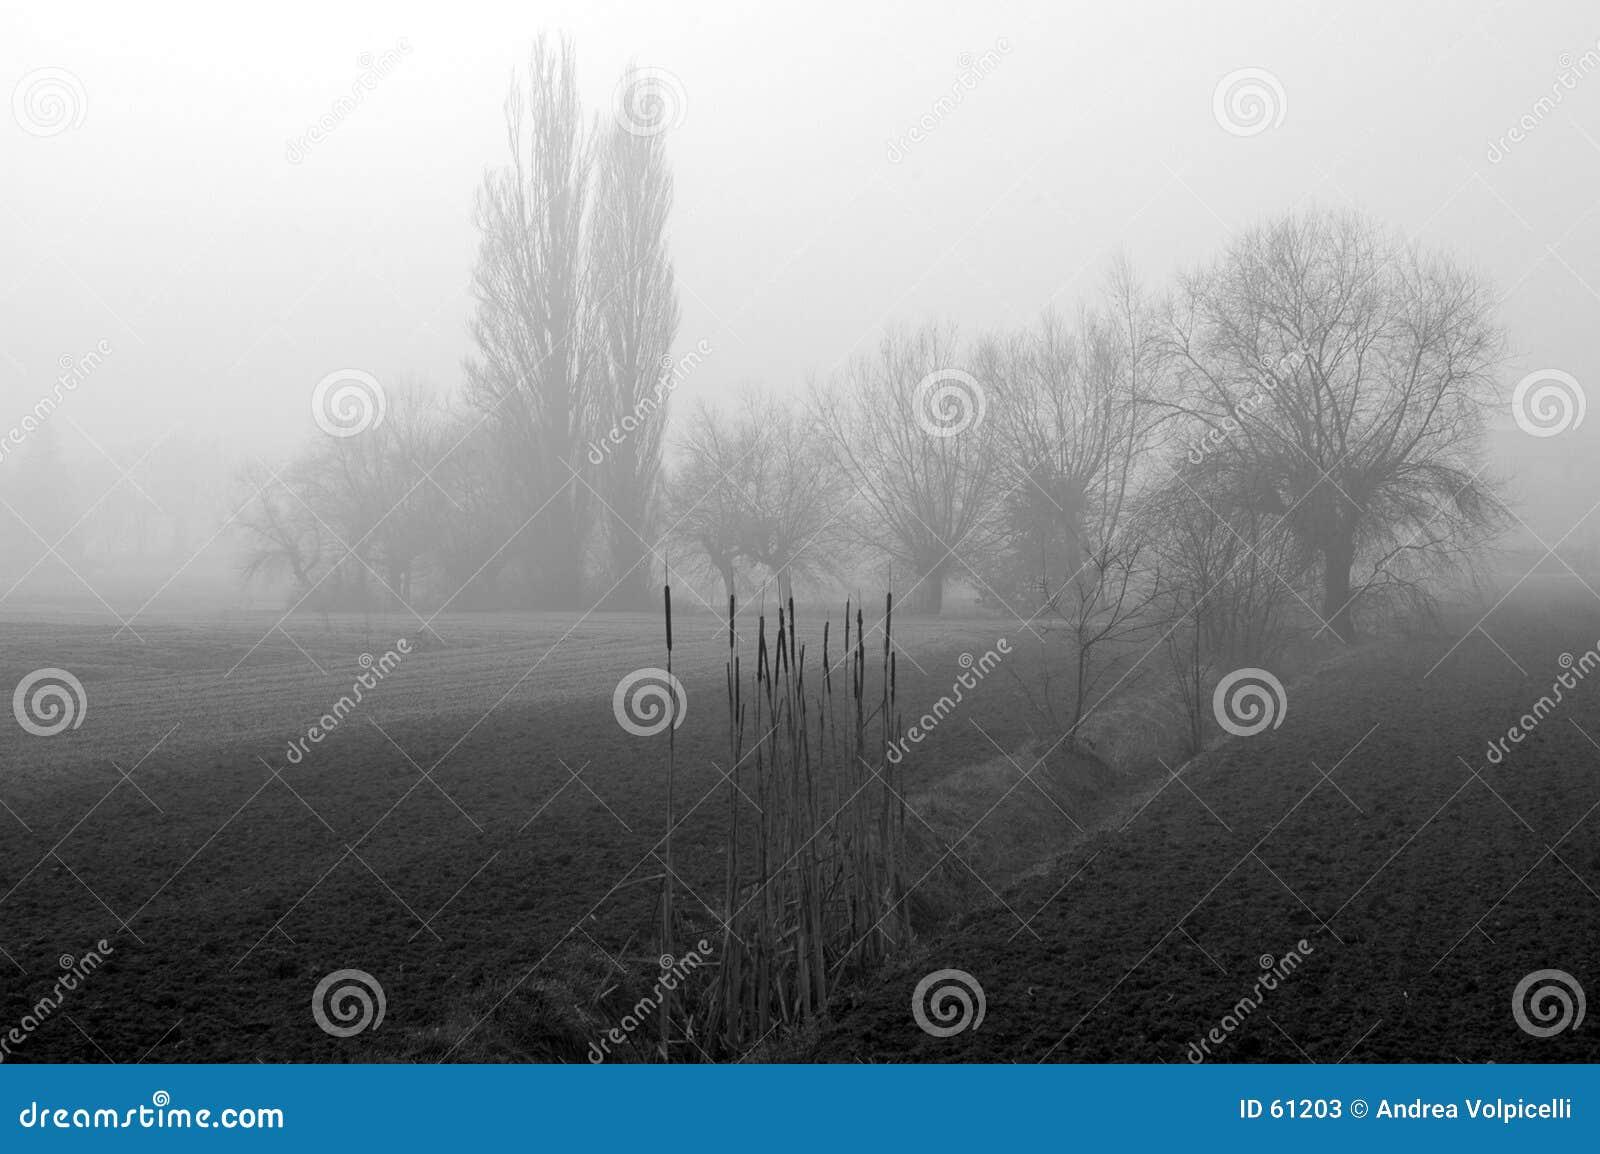 Download Ομίχλη 02 στοκ εικόνα. εικόνα από σκιαγραφία, κρύο, πτώση - 61203